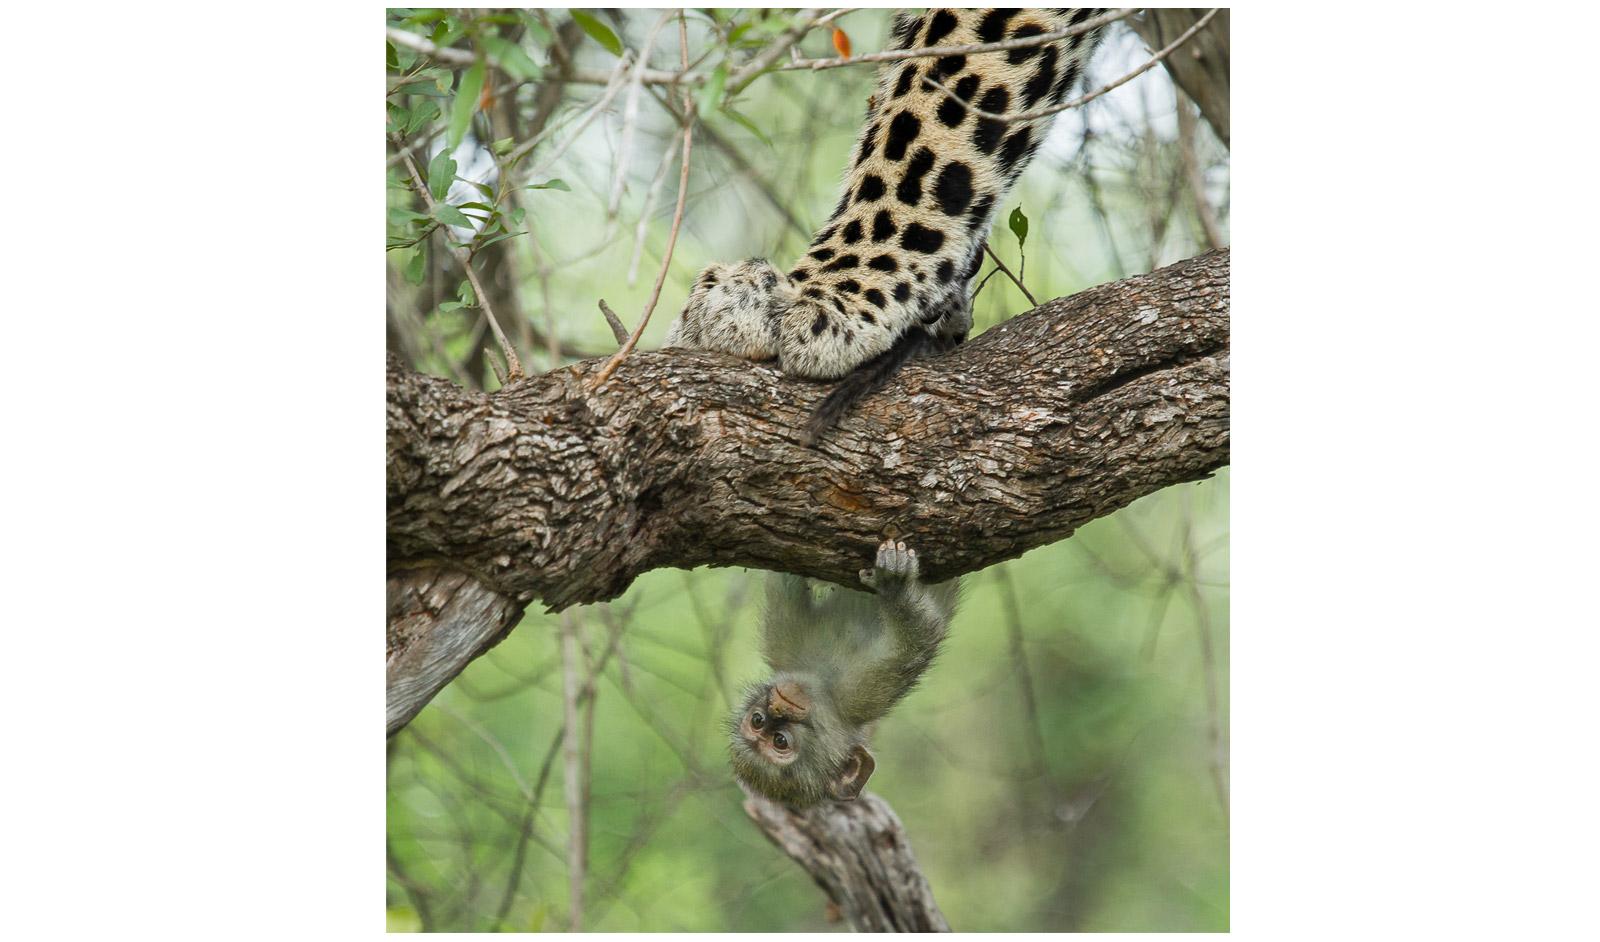 Chris-Renshaw-KrugerNP-monkey-and-leopard